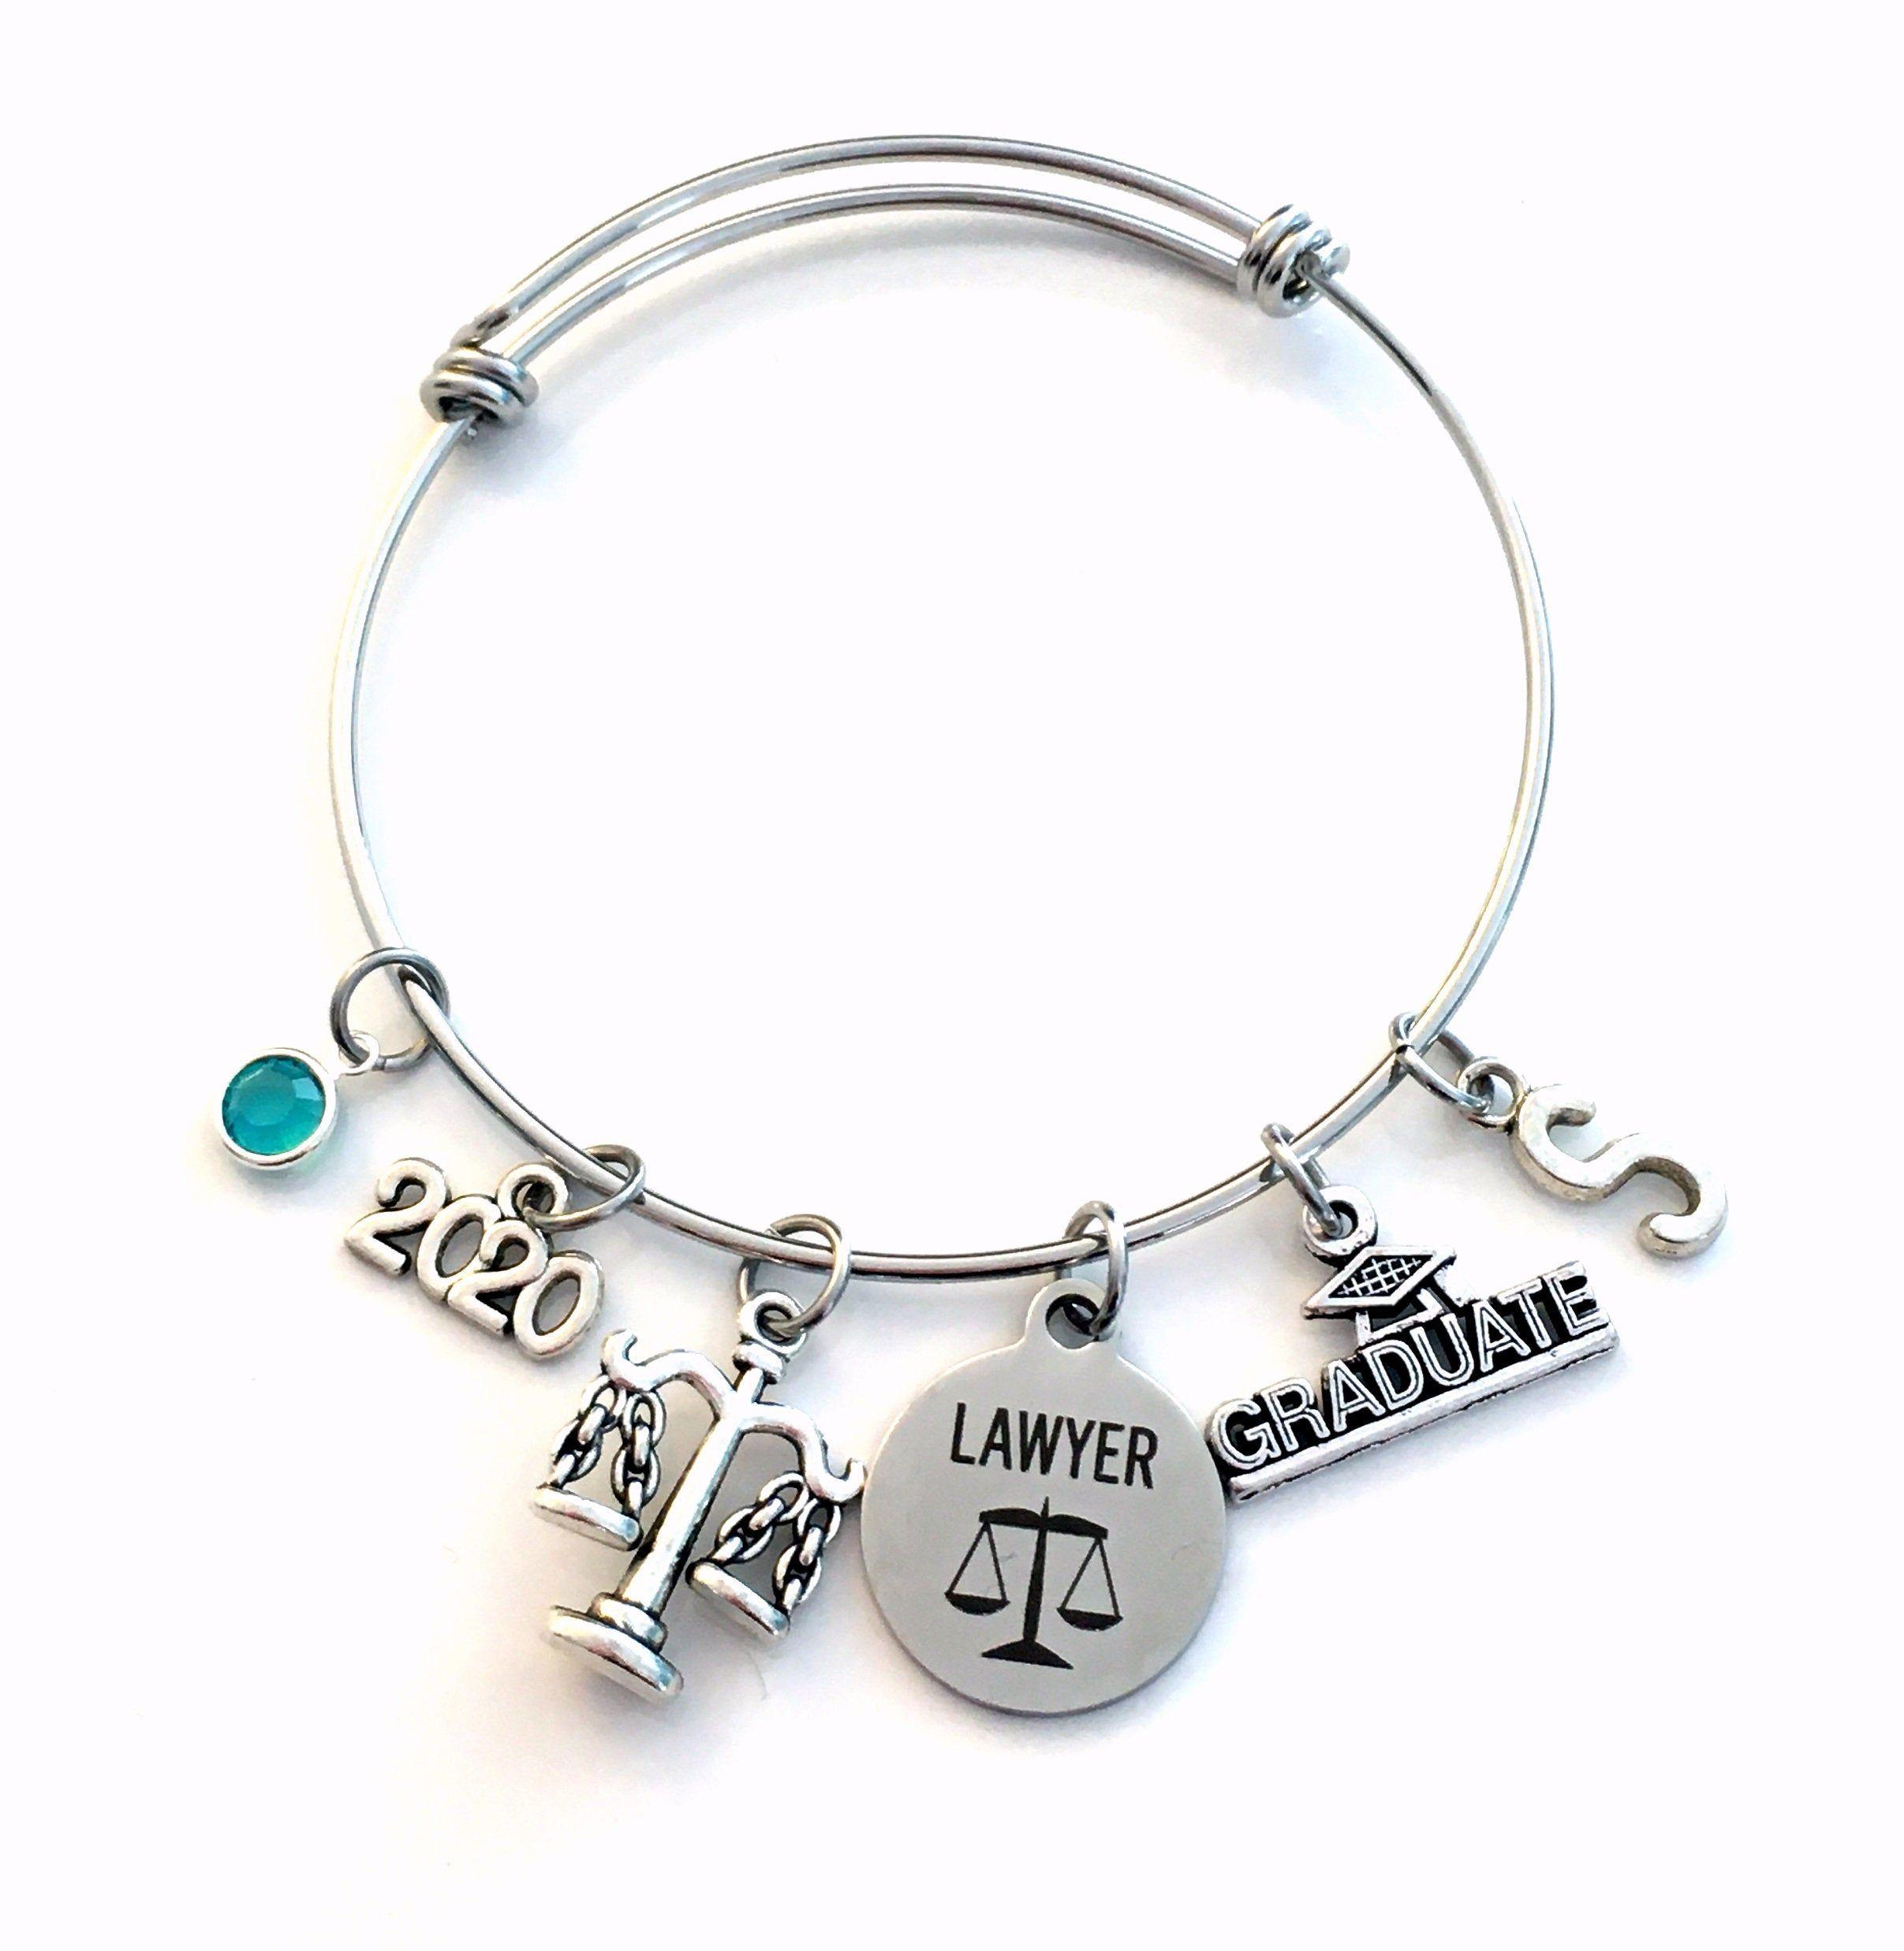 Law school graduation gift 2020 lawyer charm bracelet